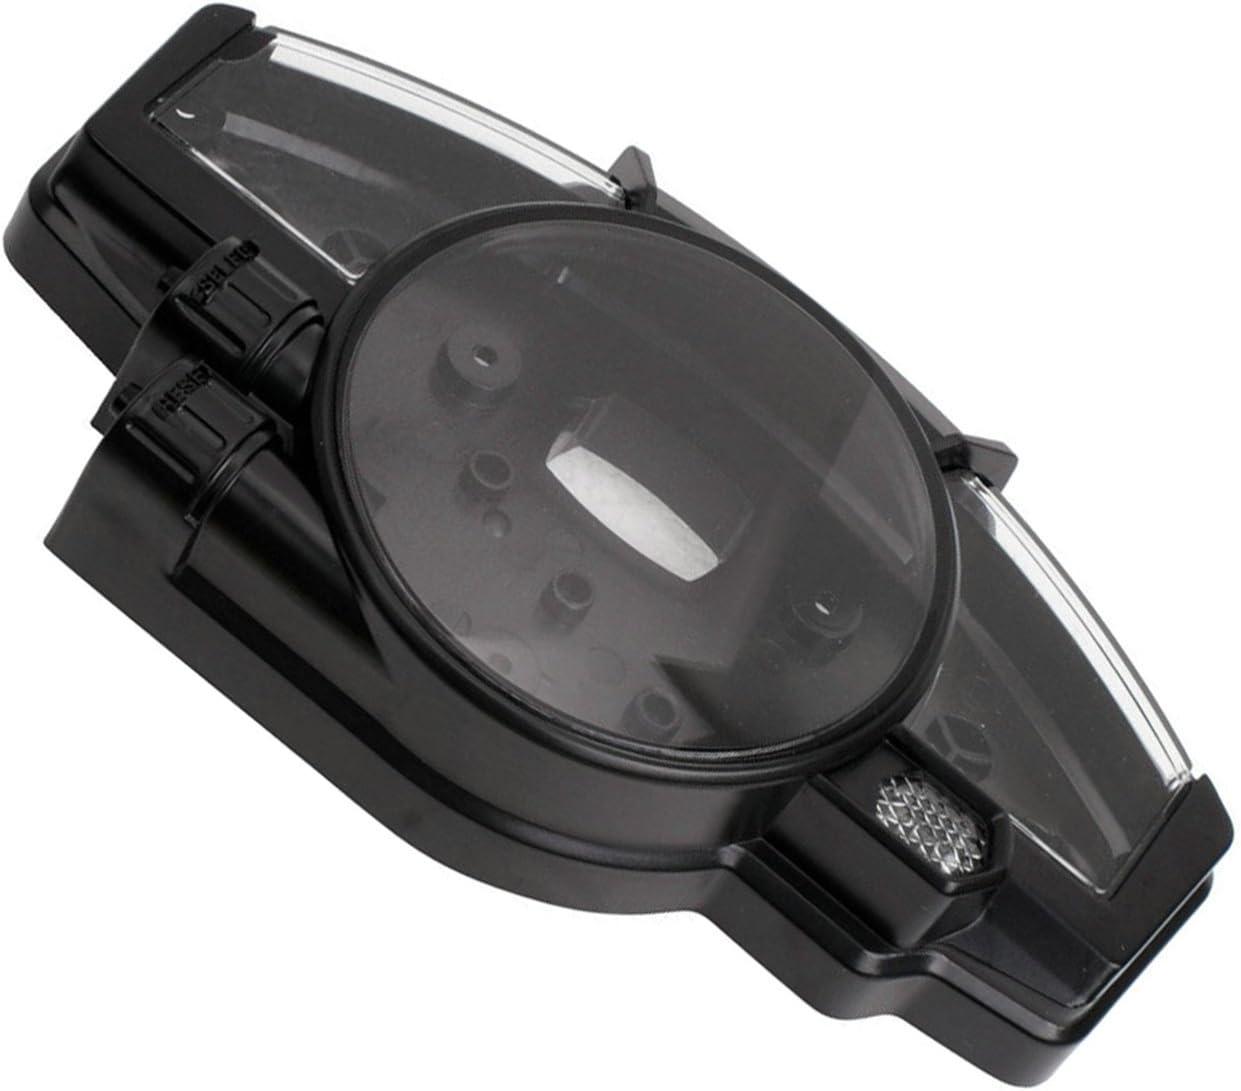 Yibid SpeedoMeter Gauge Phoenix Mall Case Finally popular brand Cover Tachometer ABS Plastic Shell